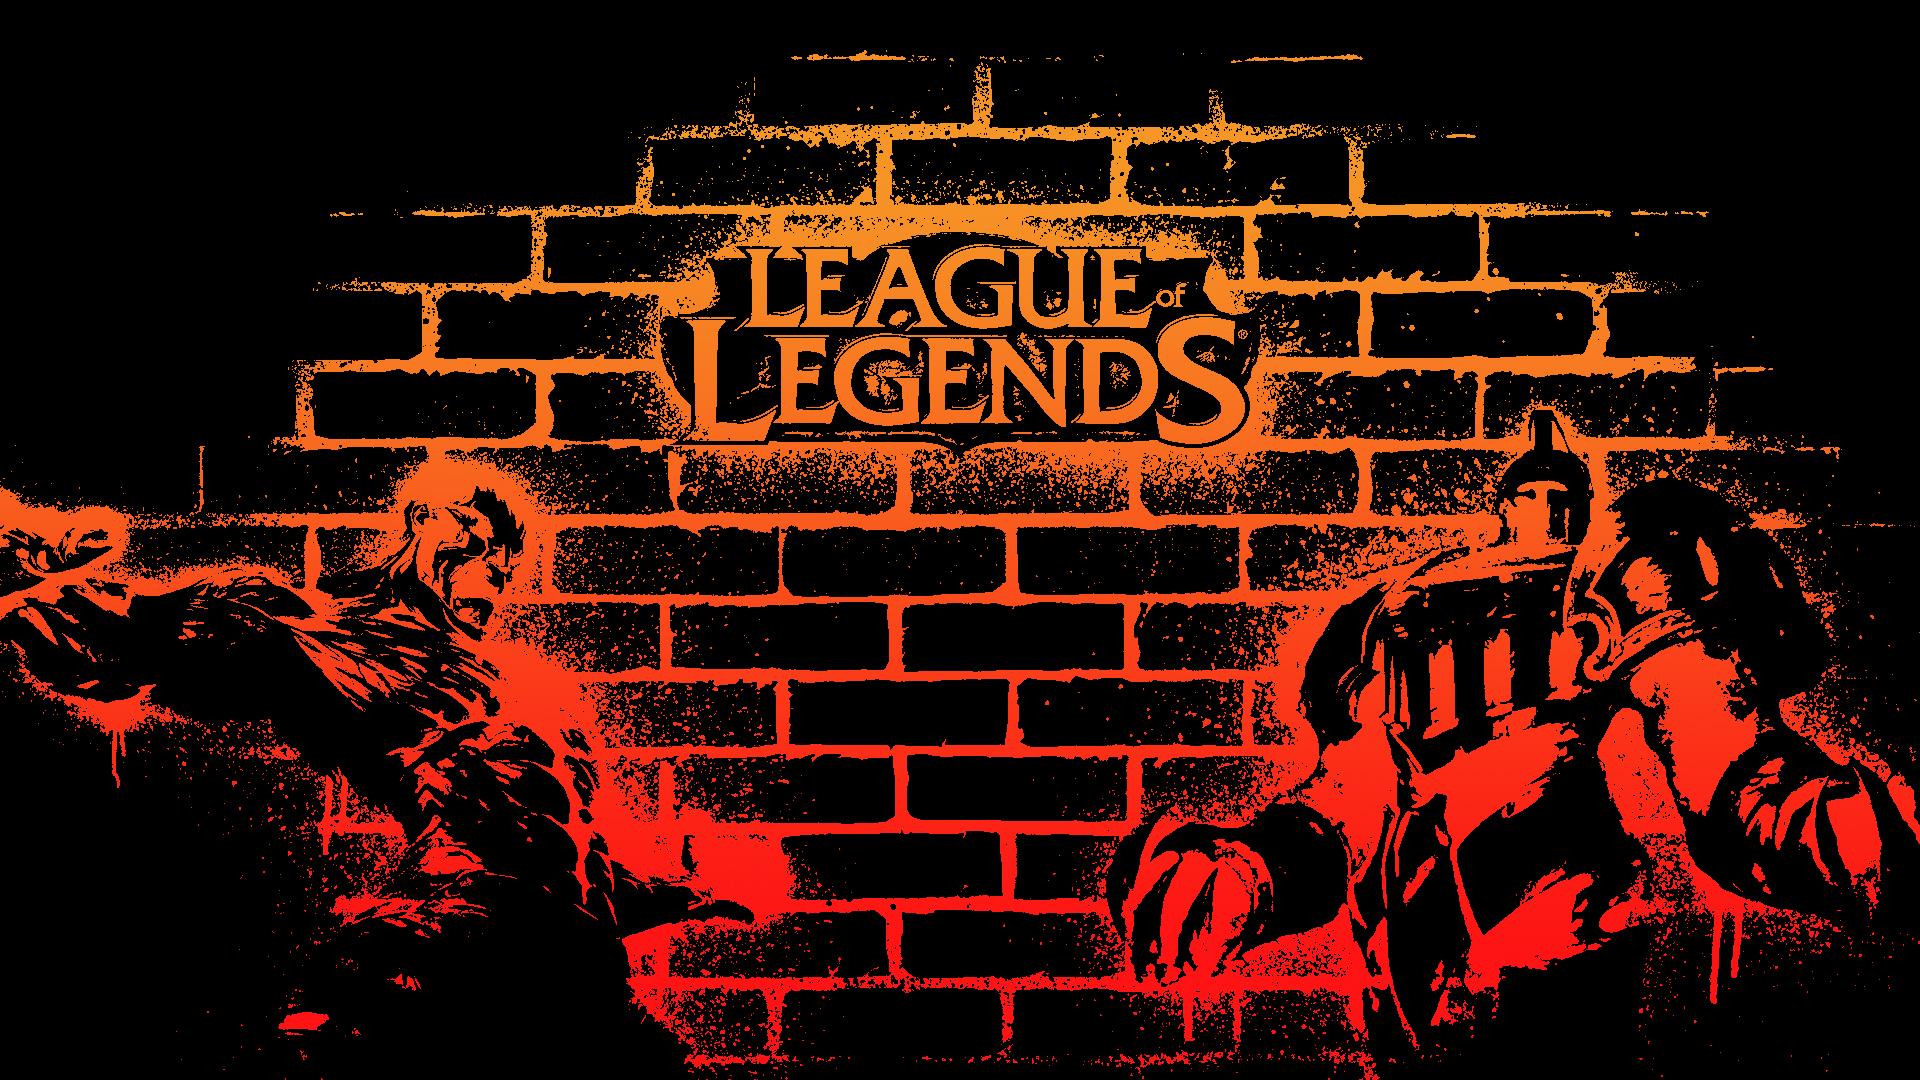 Plano De Fundo Full Hd: League Of Legends Full HD Papel De Parede And Planos De